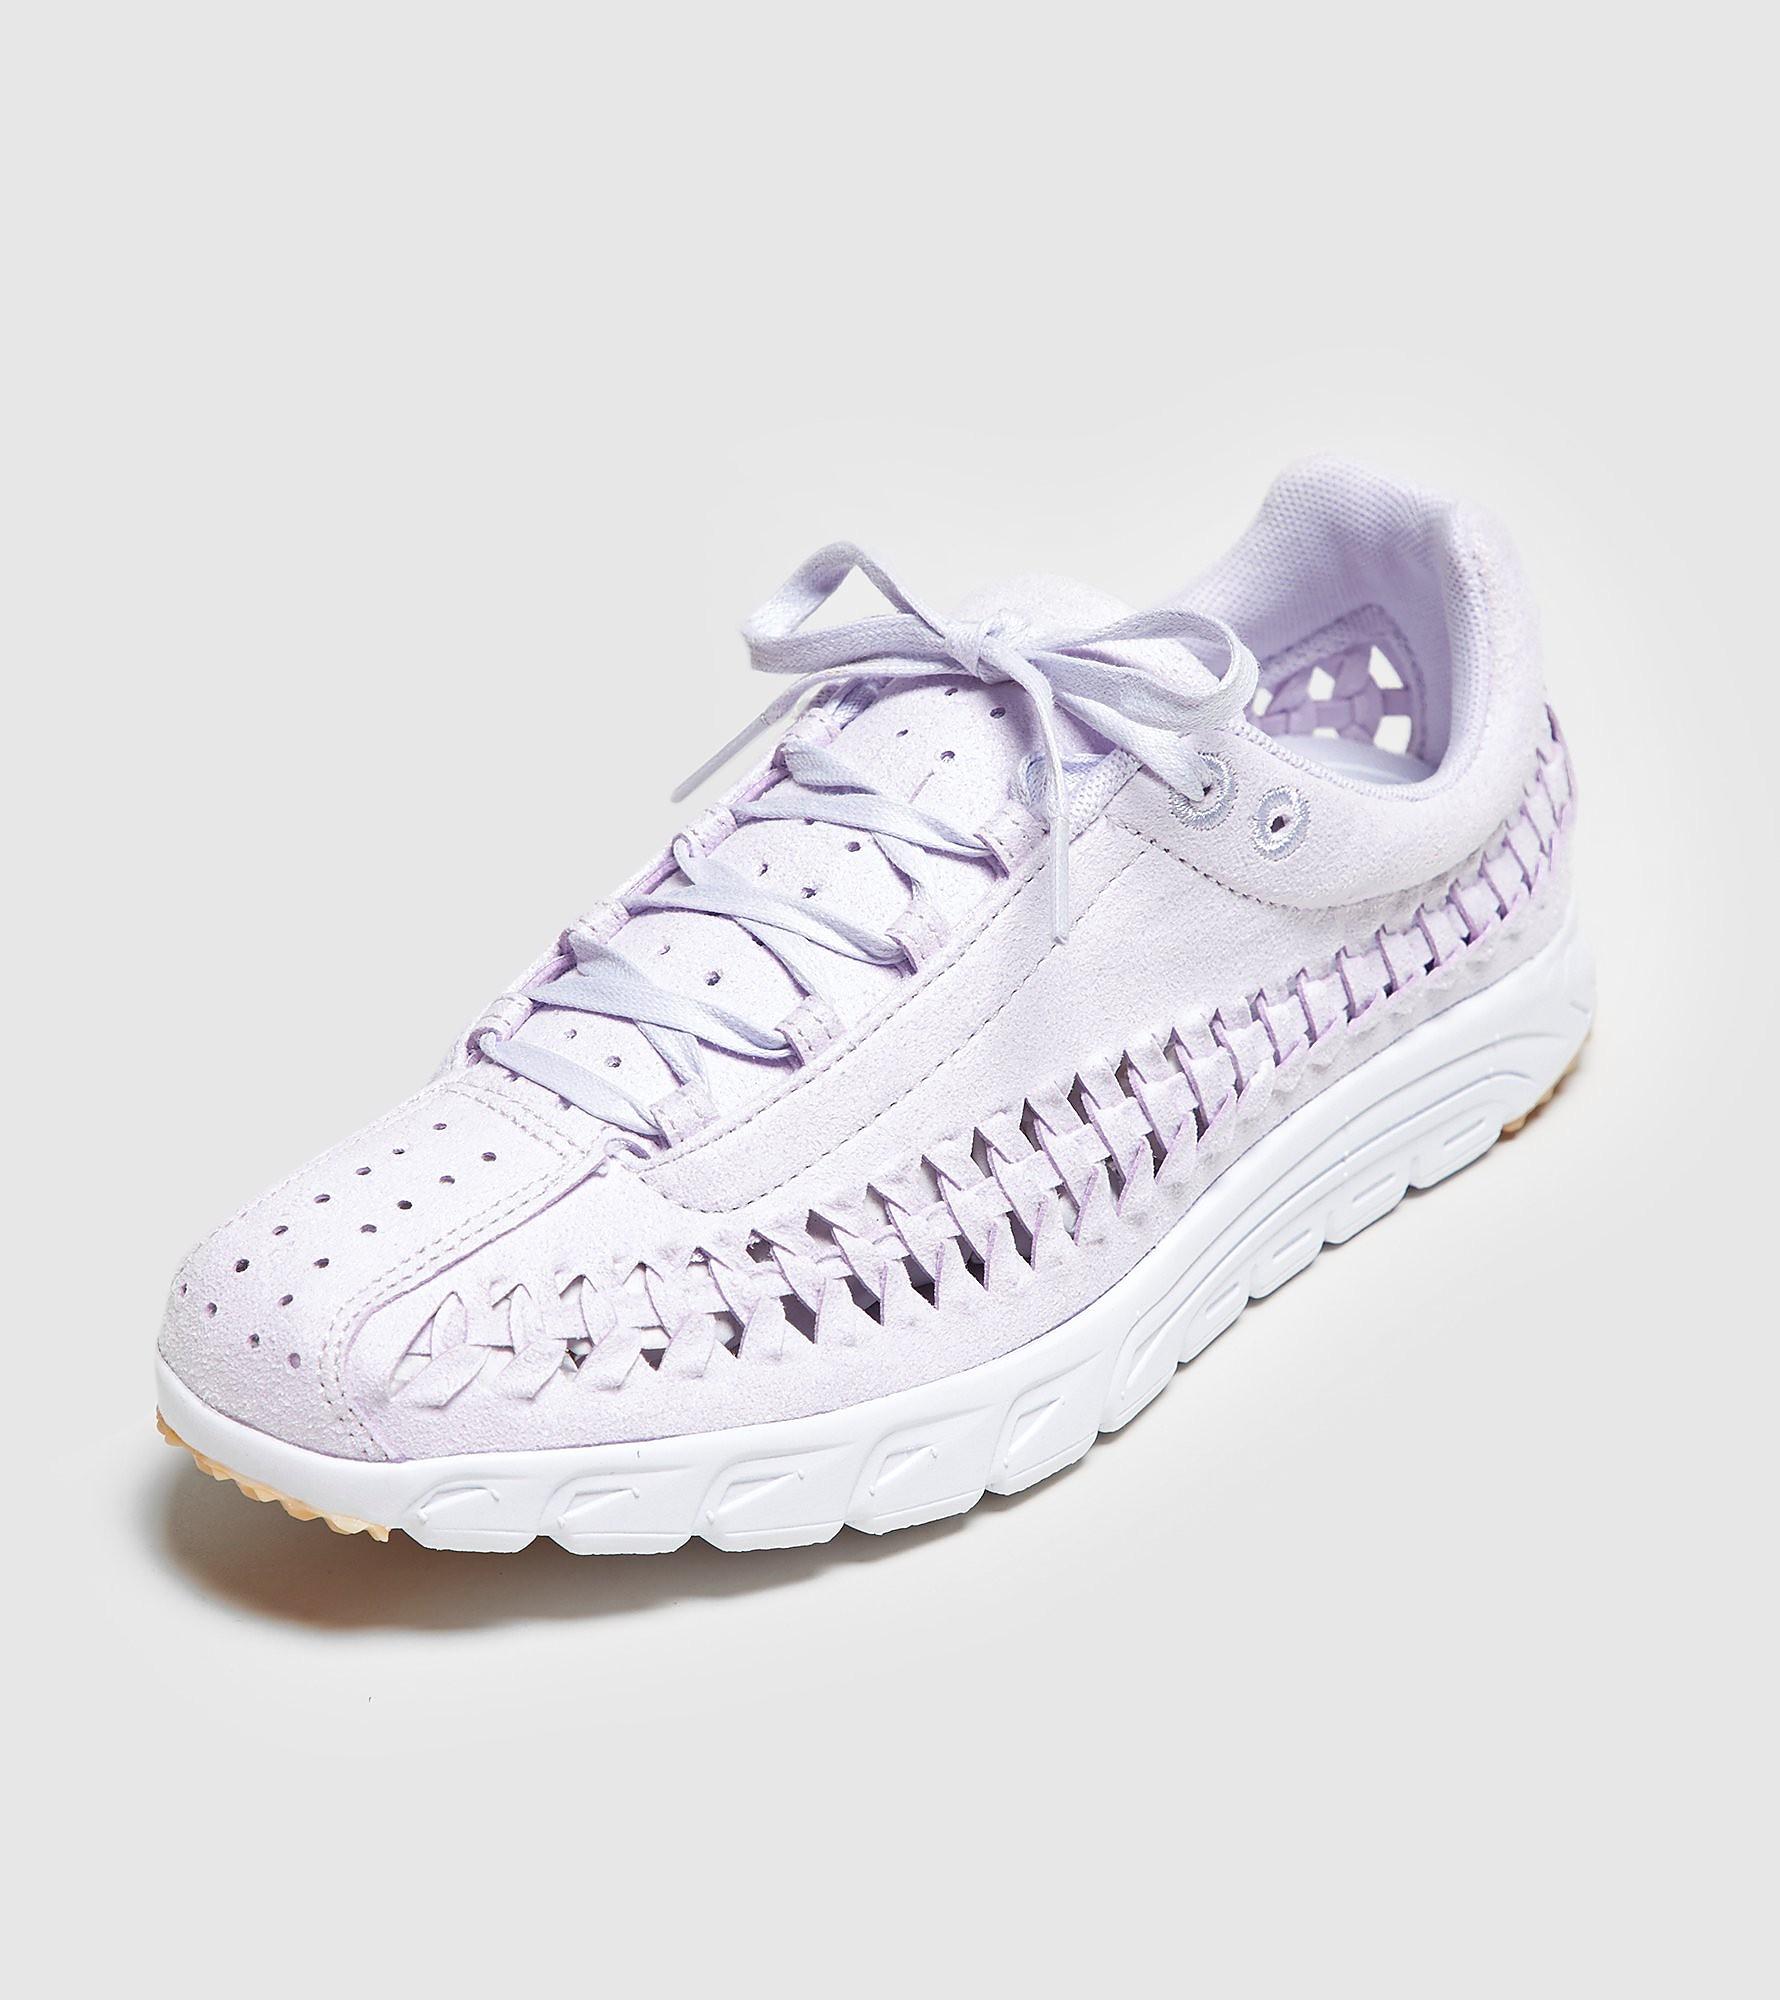 Nike Mayfly Satin Women's